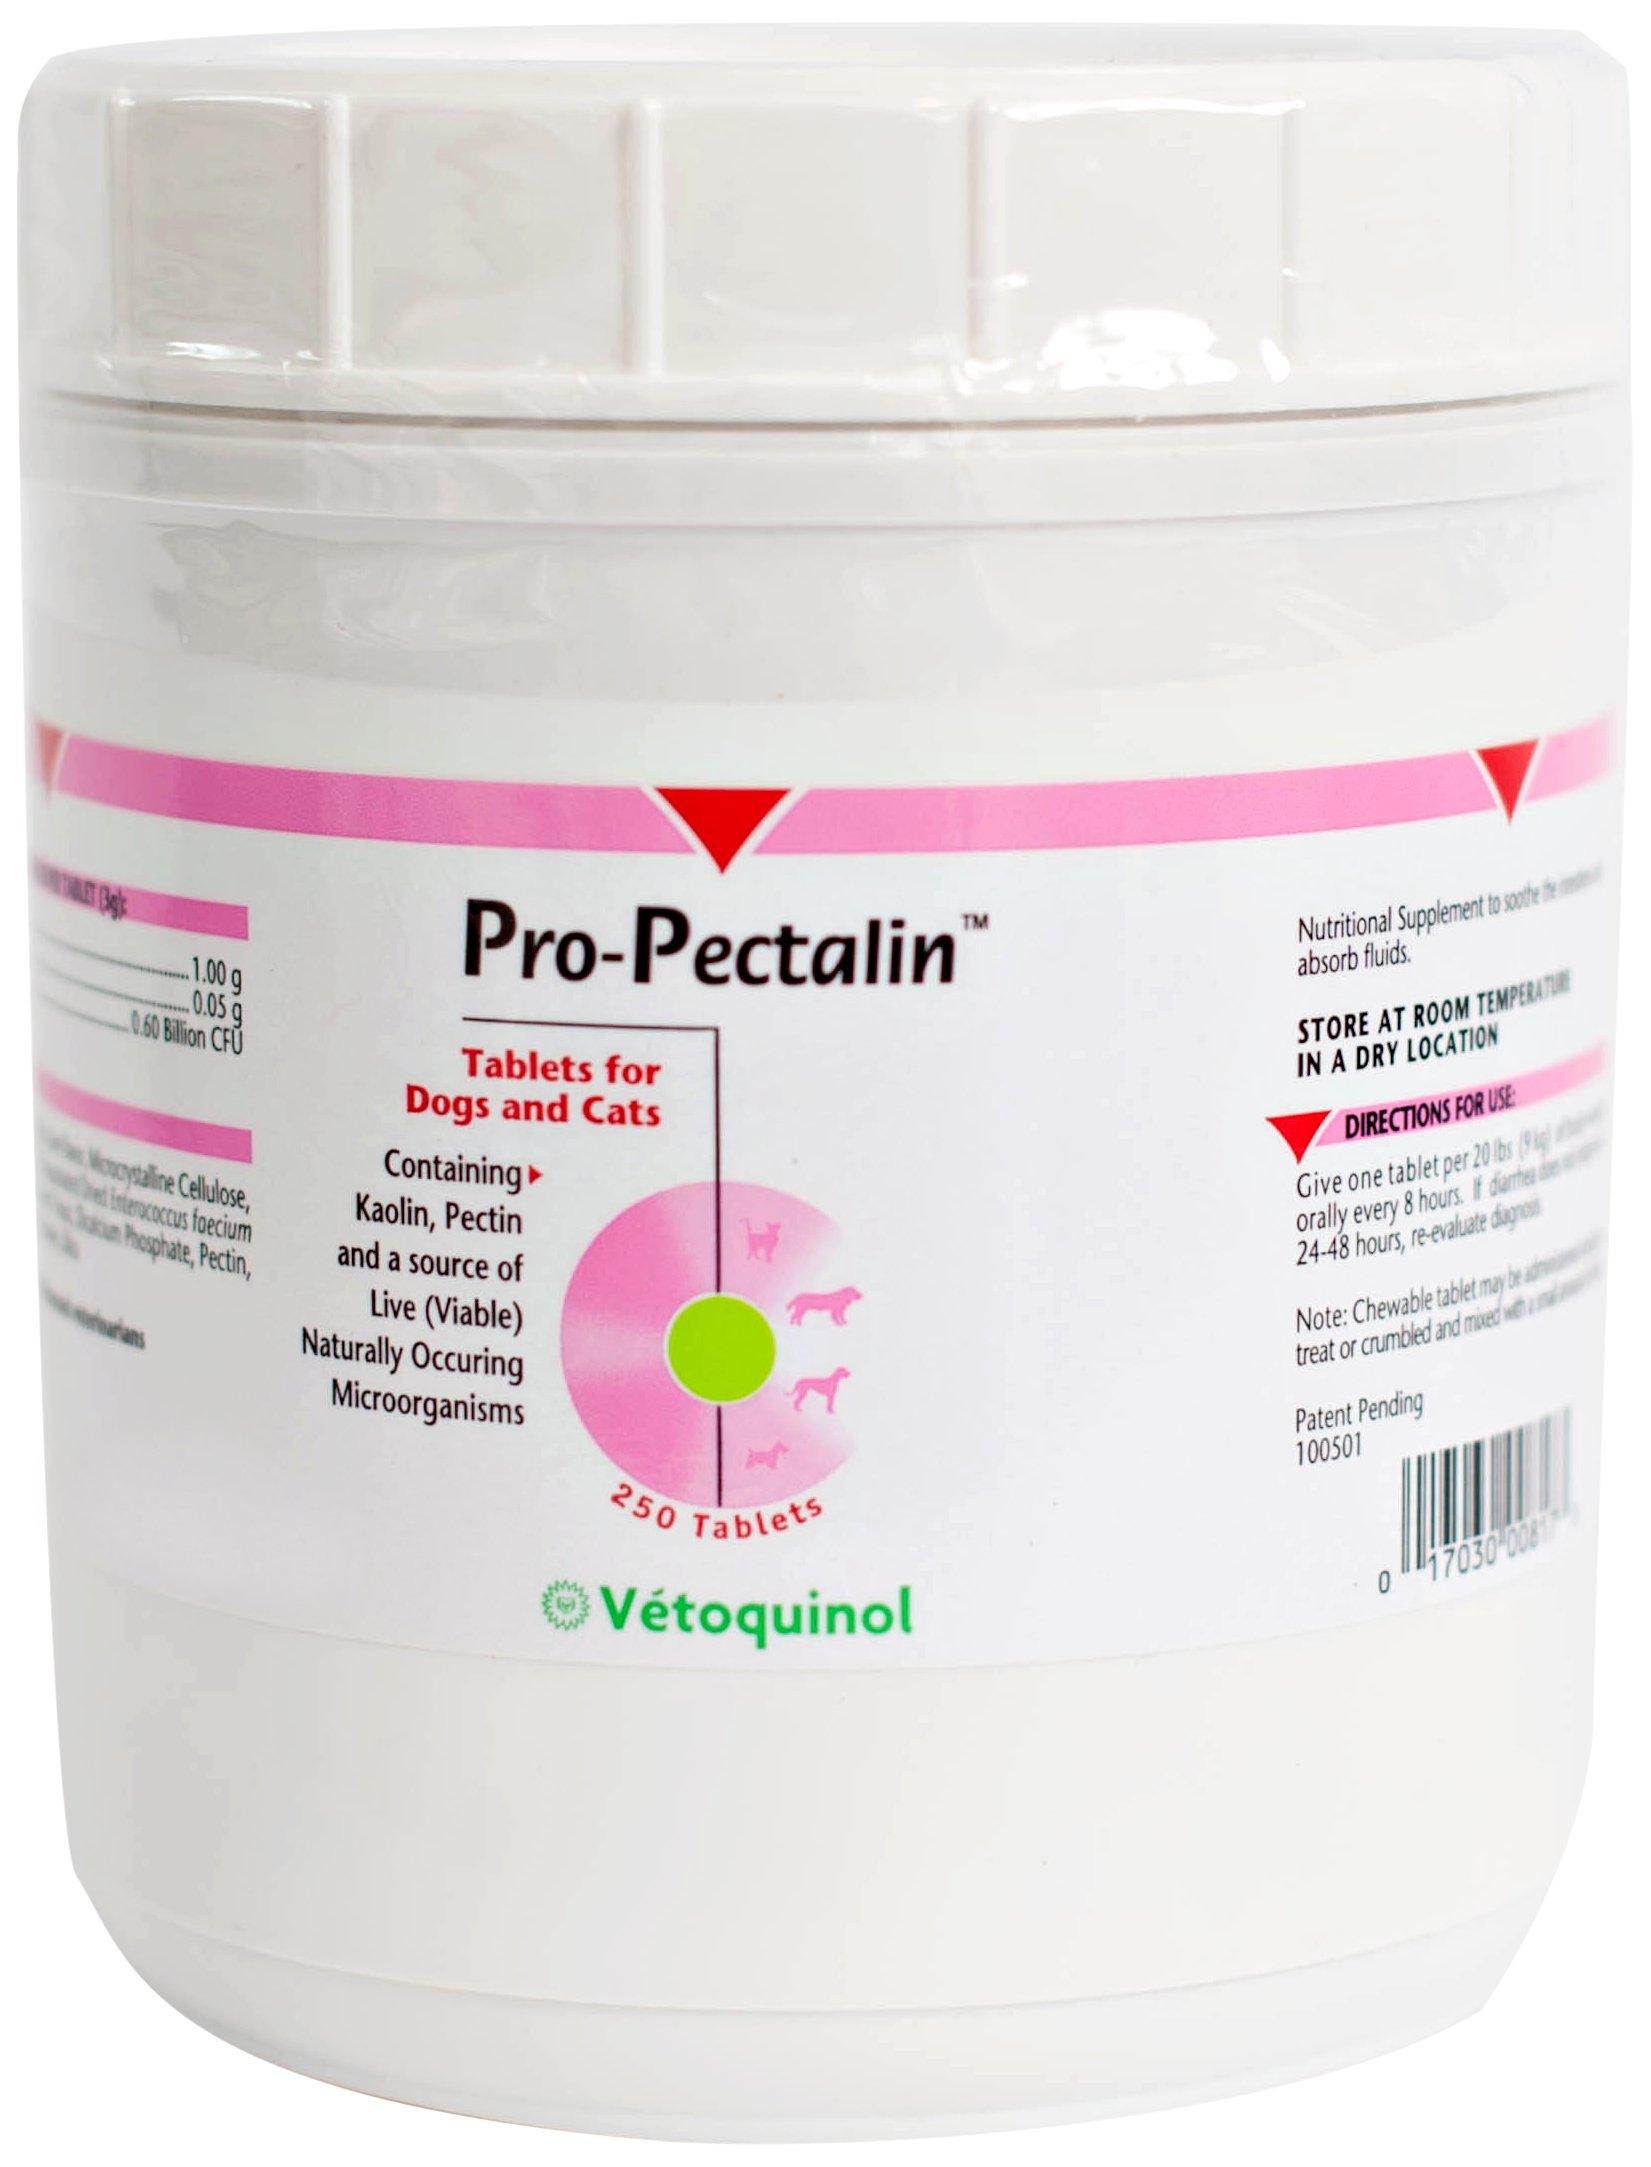 Vetoquinol 410817 Pro-Pectalin,250 ct